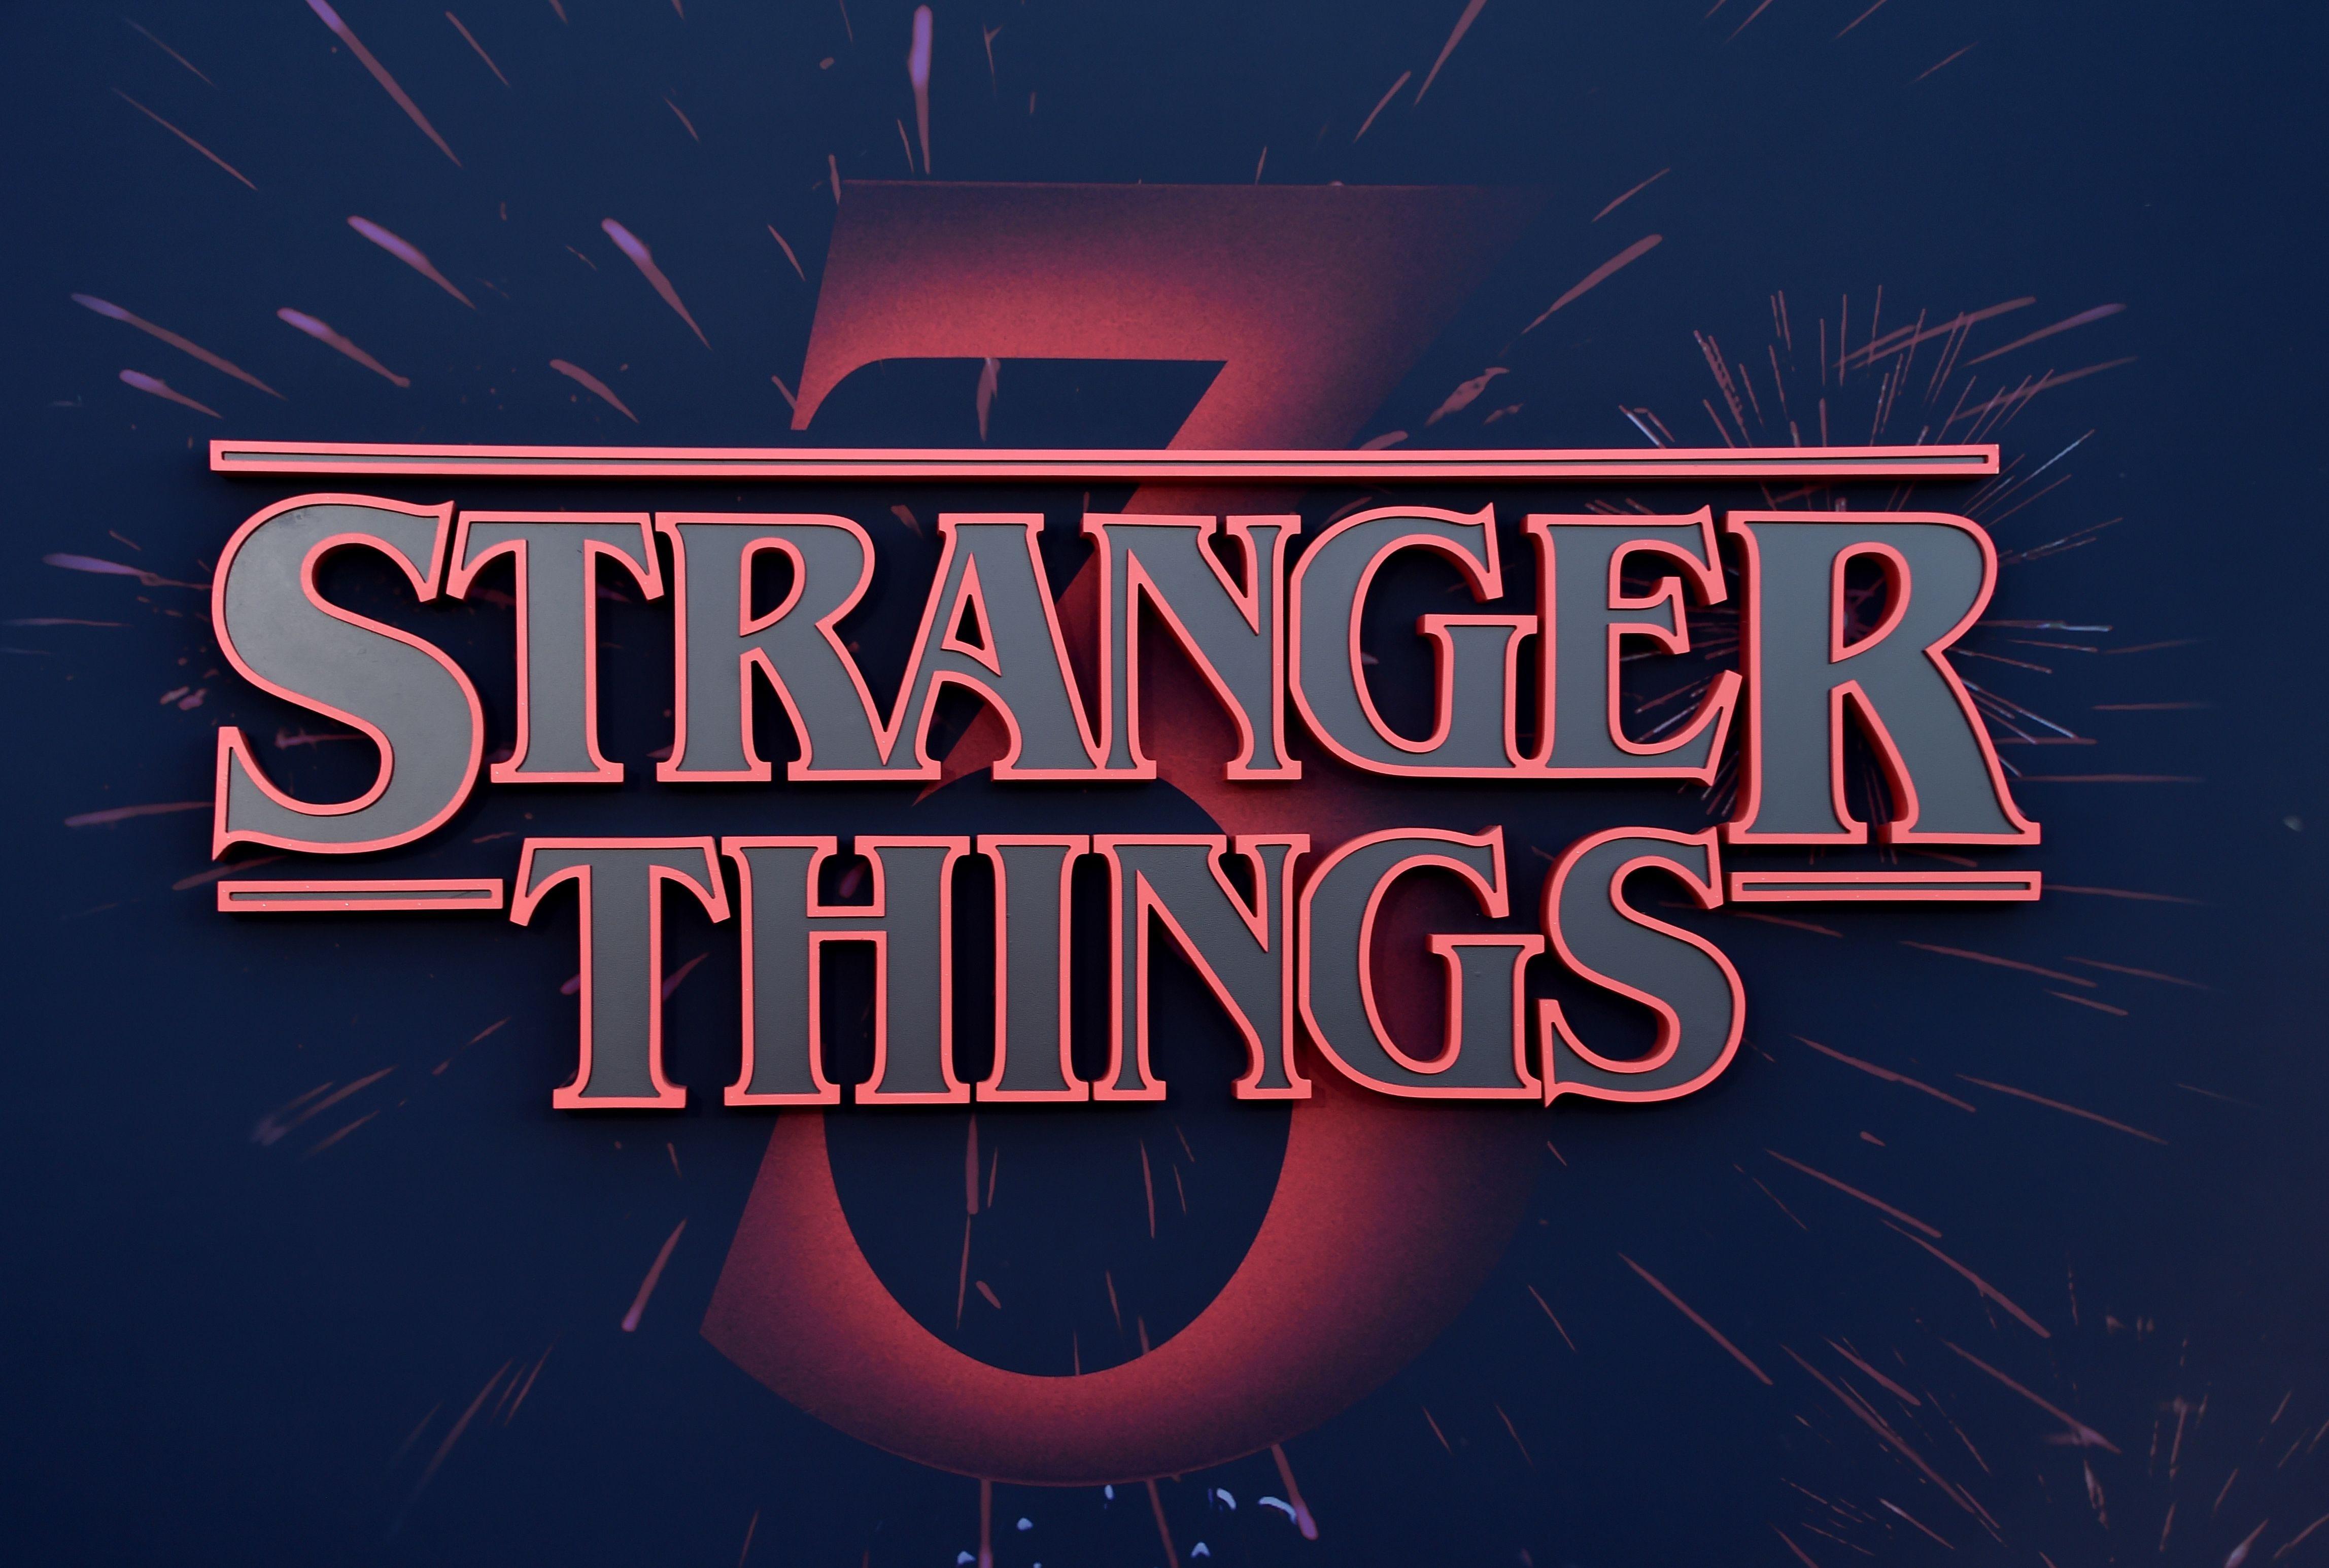 Priah Ferguson talks about 'Stranger Things' Season 3